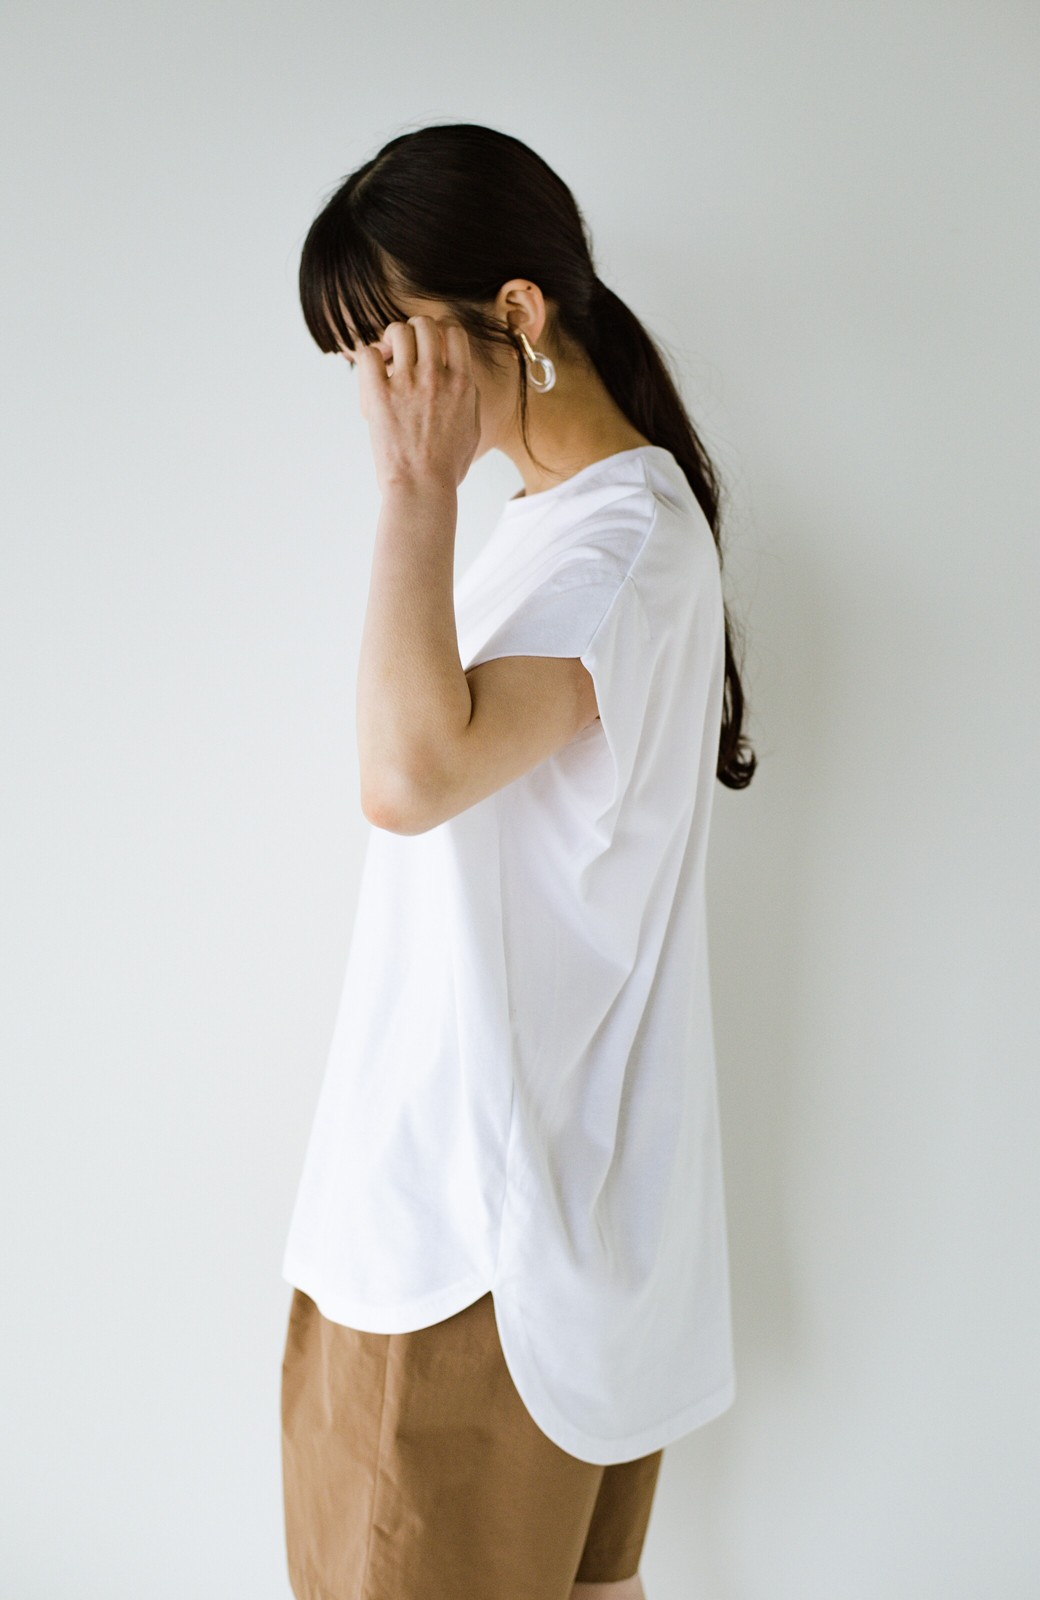 haco! PBPオーガニックコットン 楽ちんなのにブラウス気分で着られる大人のおめかしTシャツ <ホワイト>の商品写真23